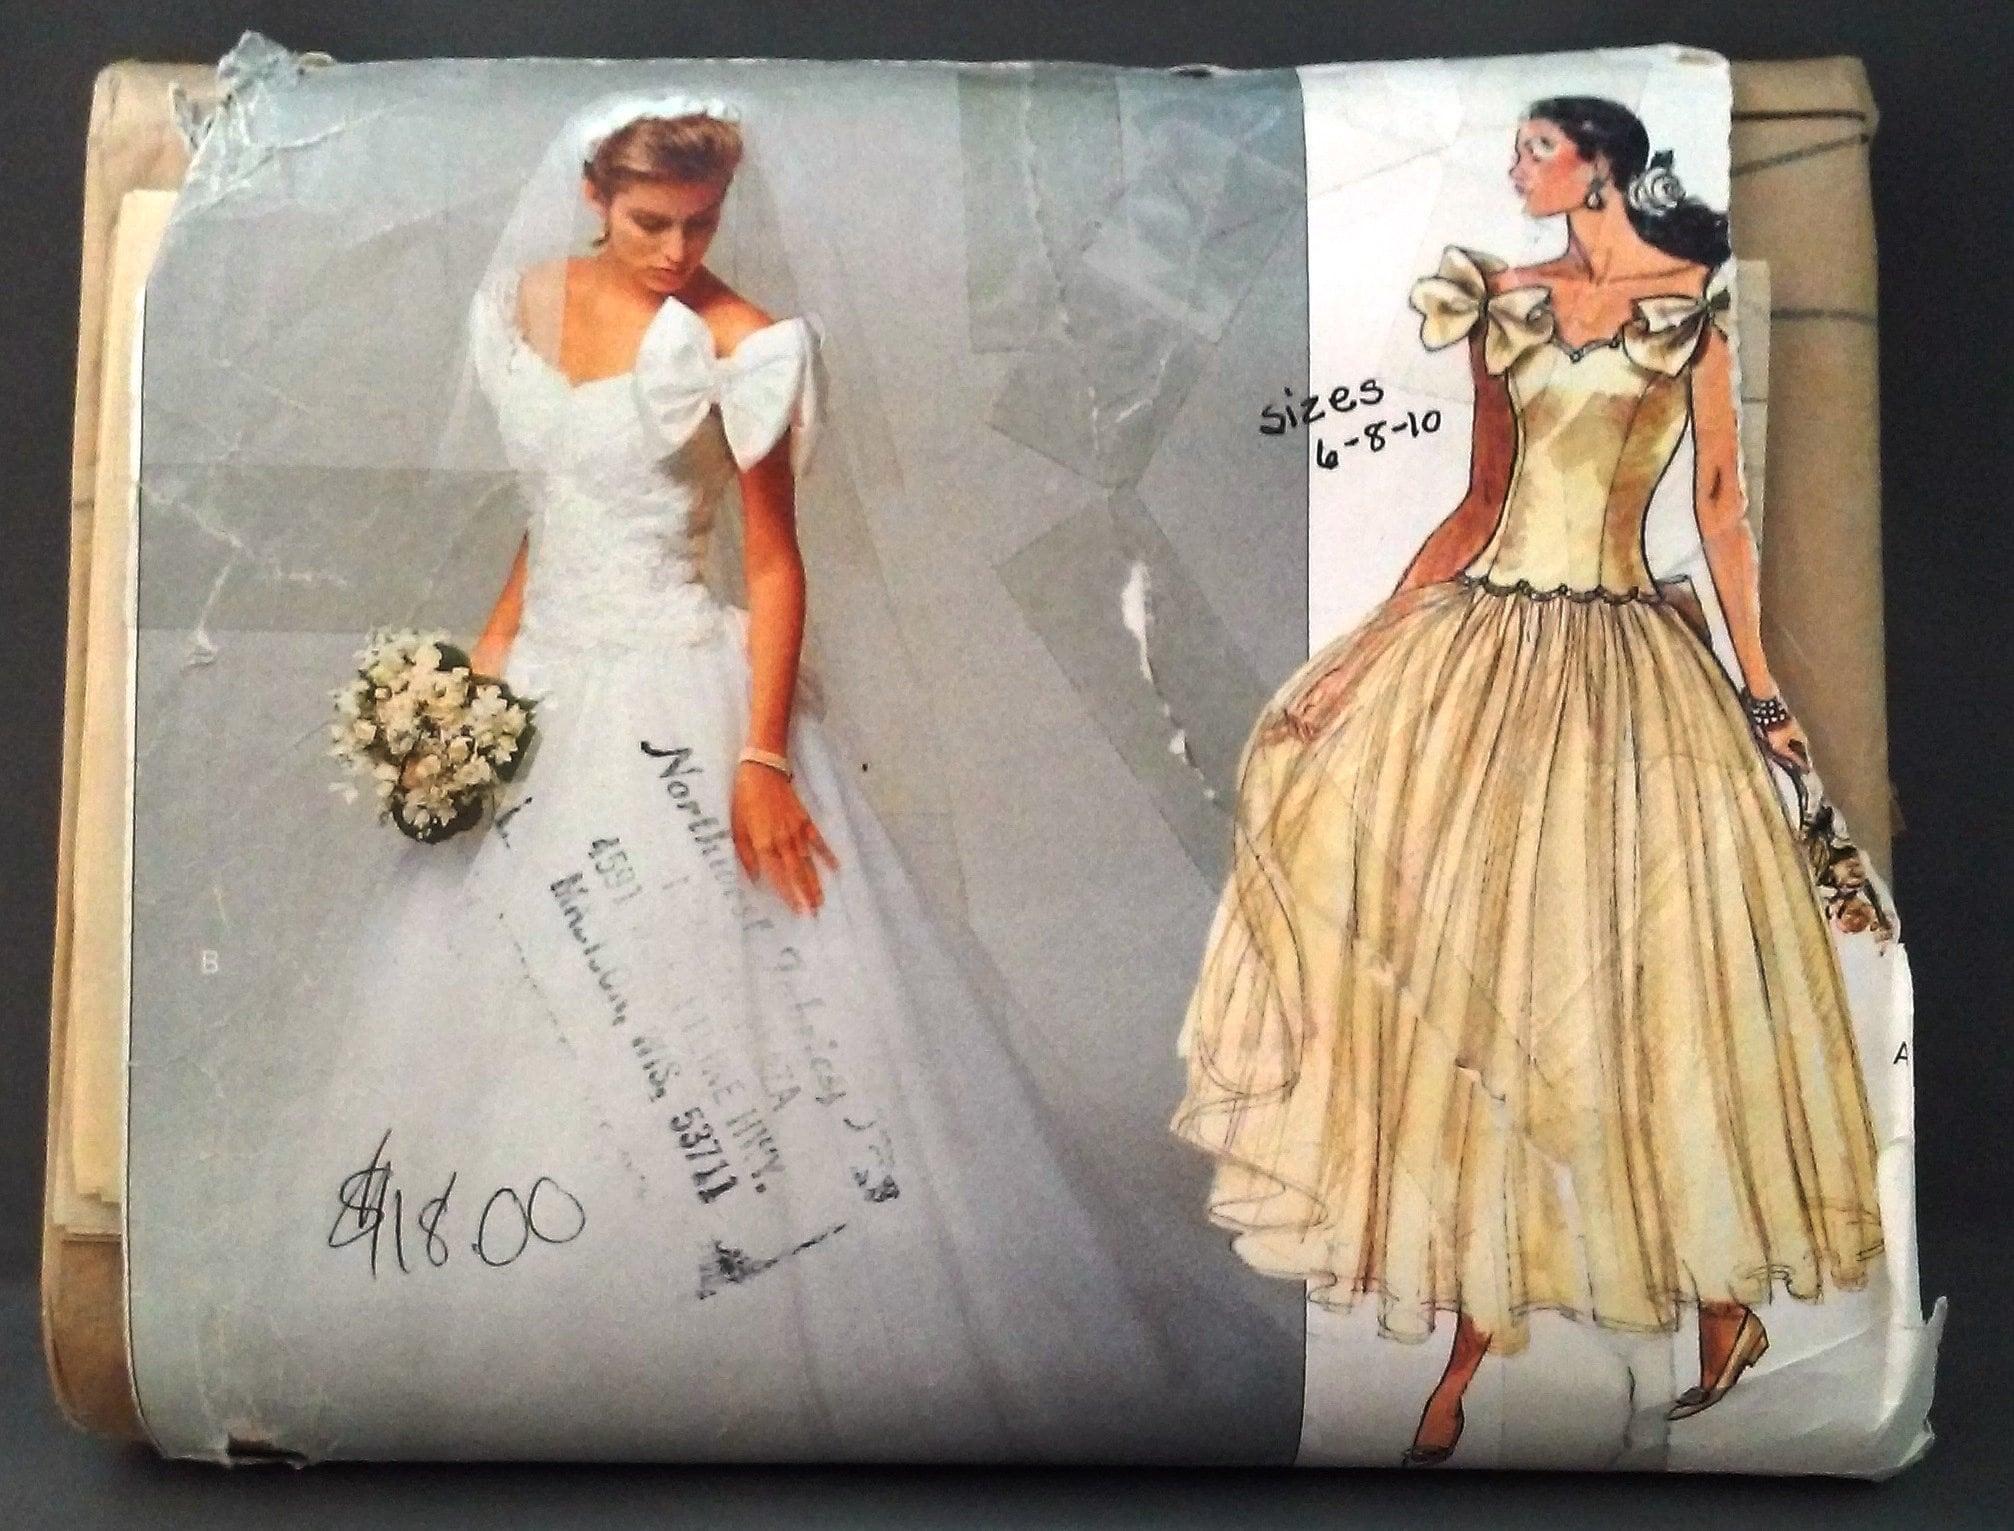 50: Bridal Originals 1990s Wedding Dresses At Reisefeber.org